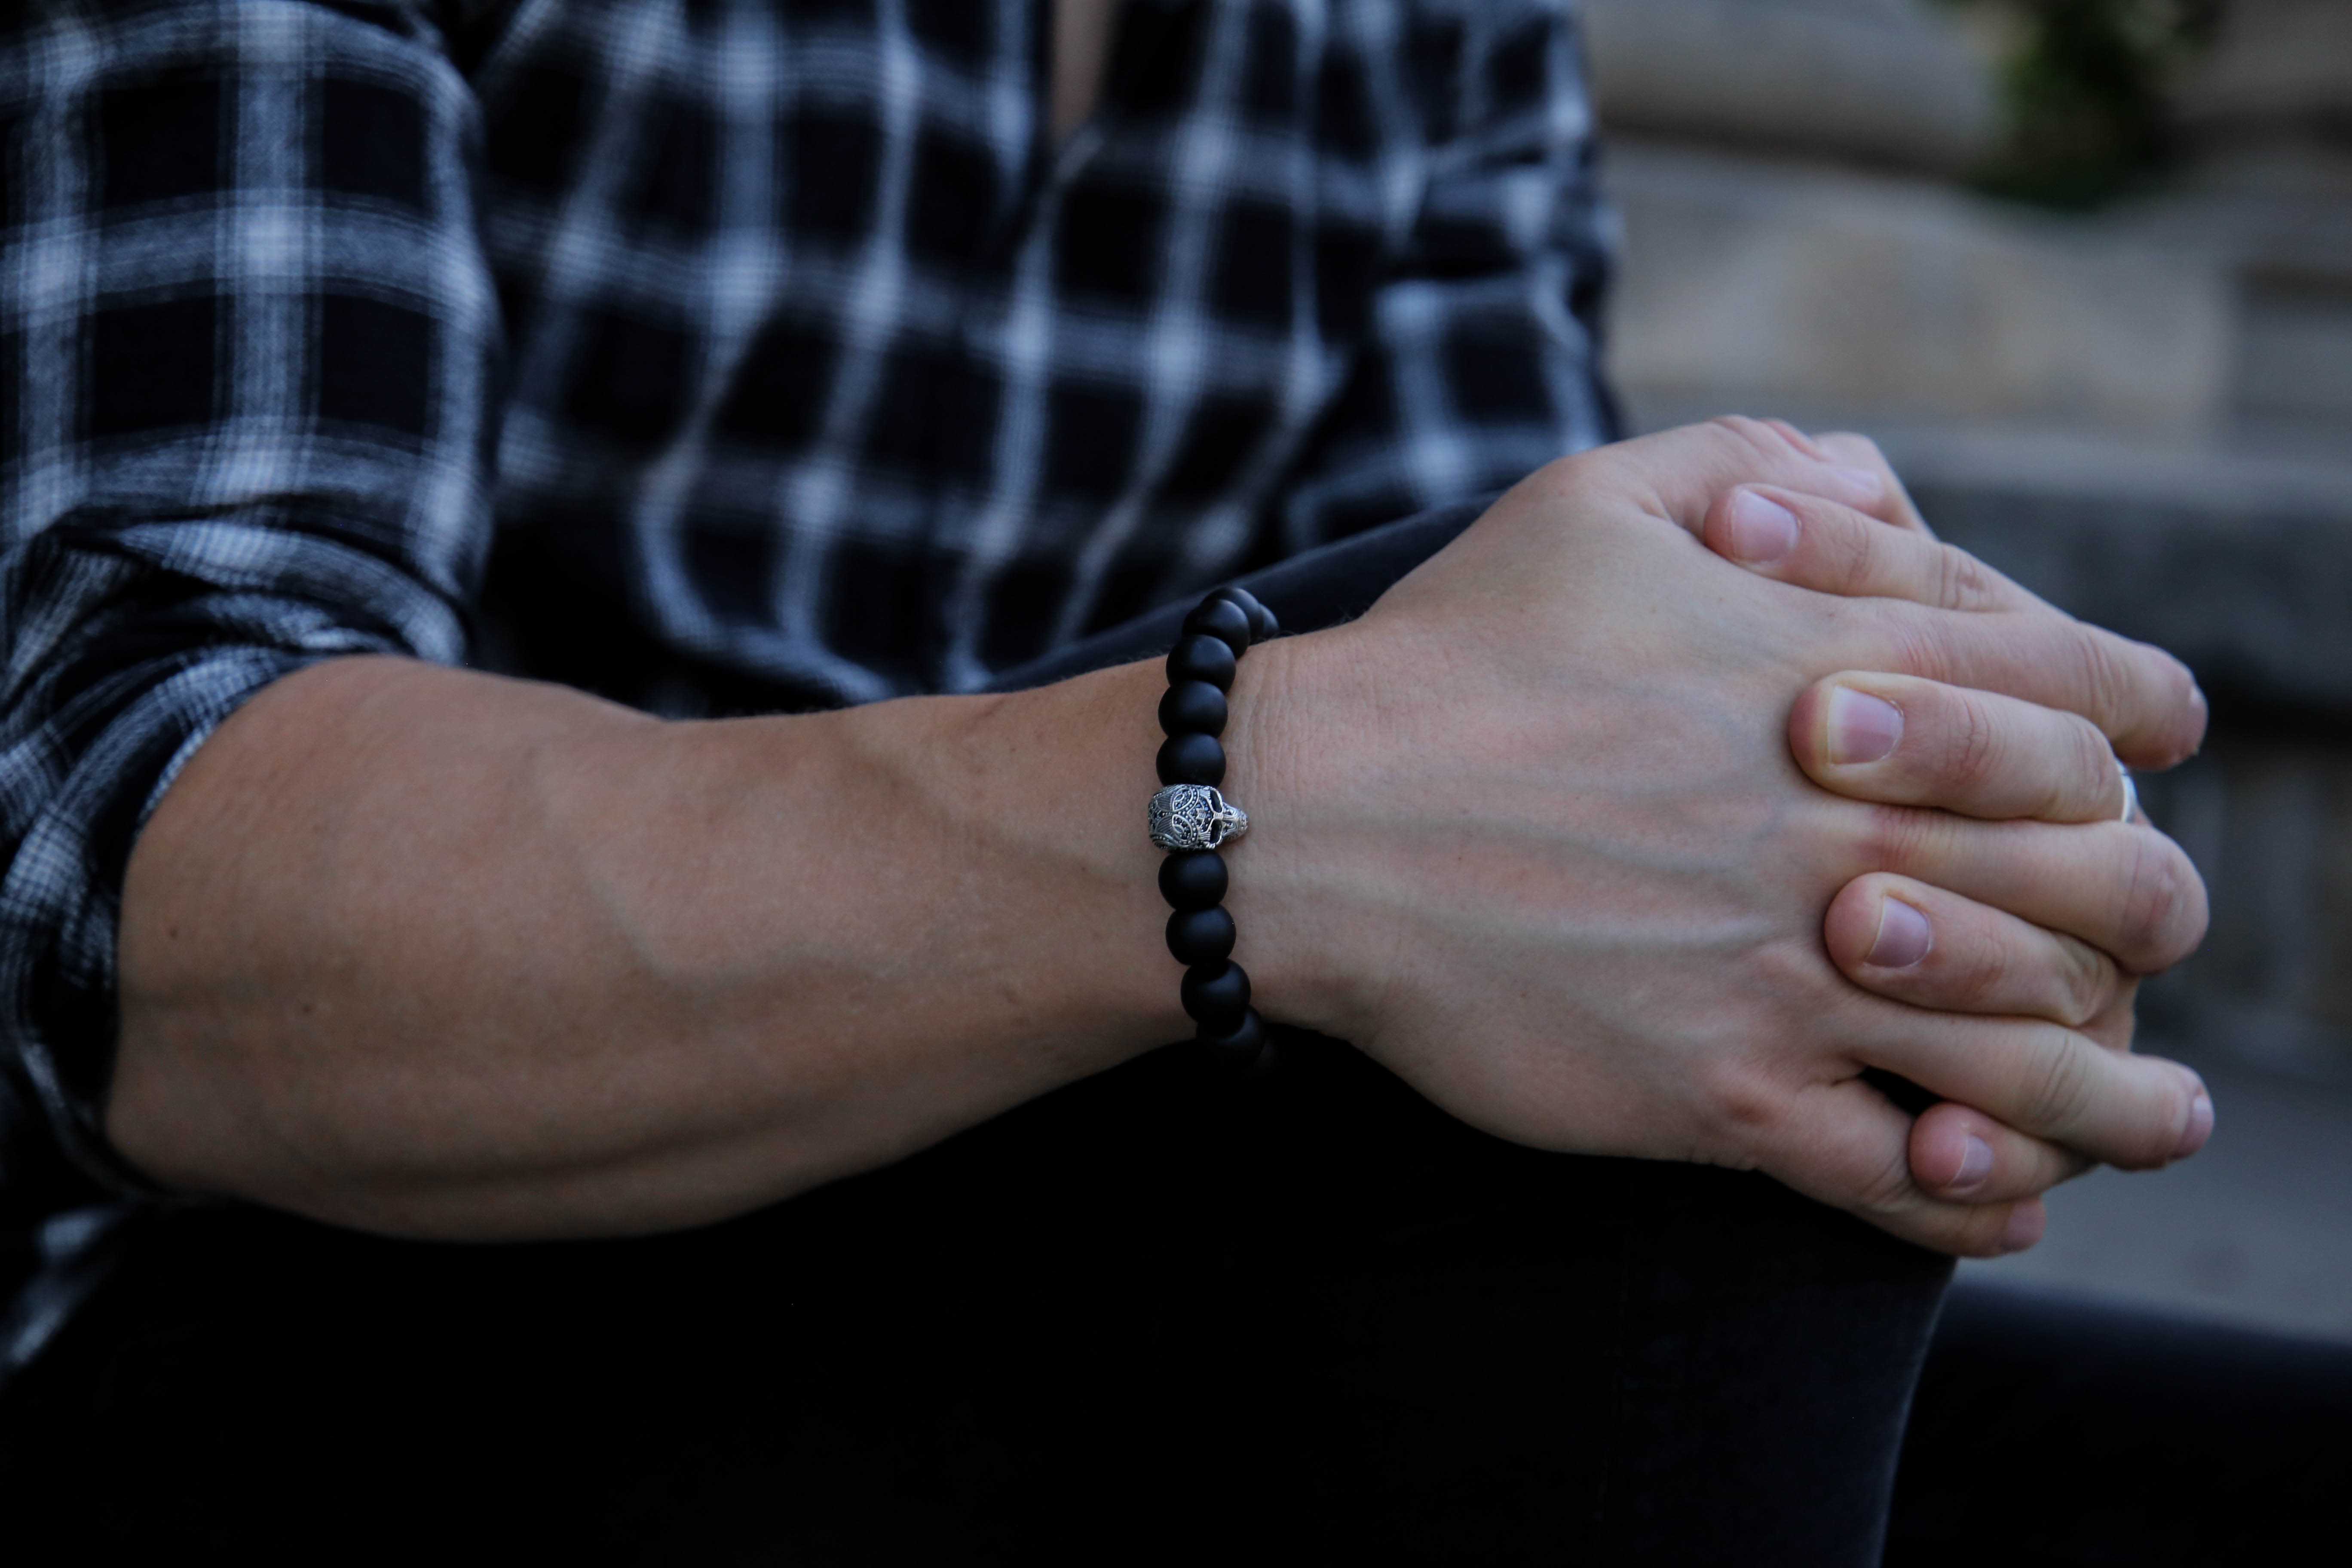 september-outfit-schwarzes-karohemd-totenkopf-armbänder-modeblog-fashionlook-männerblog_9749